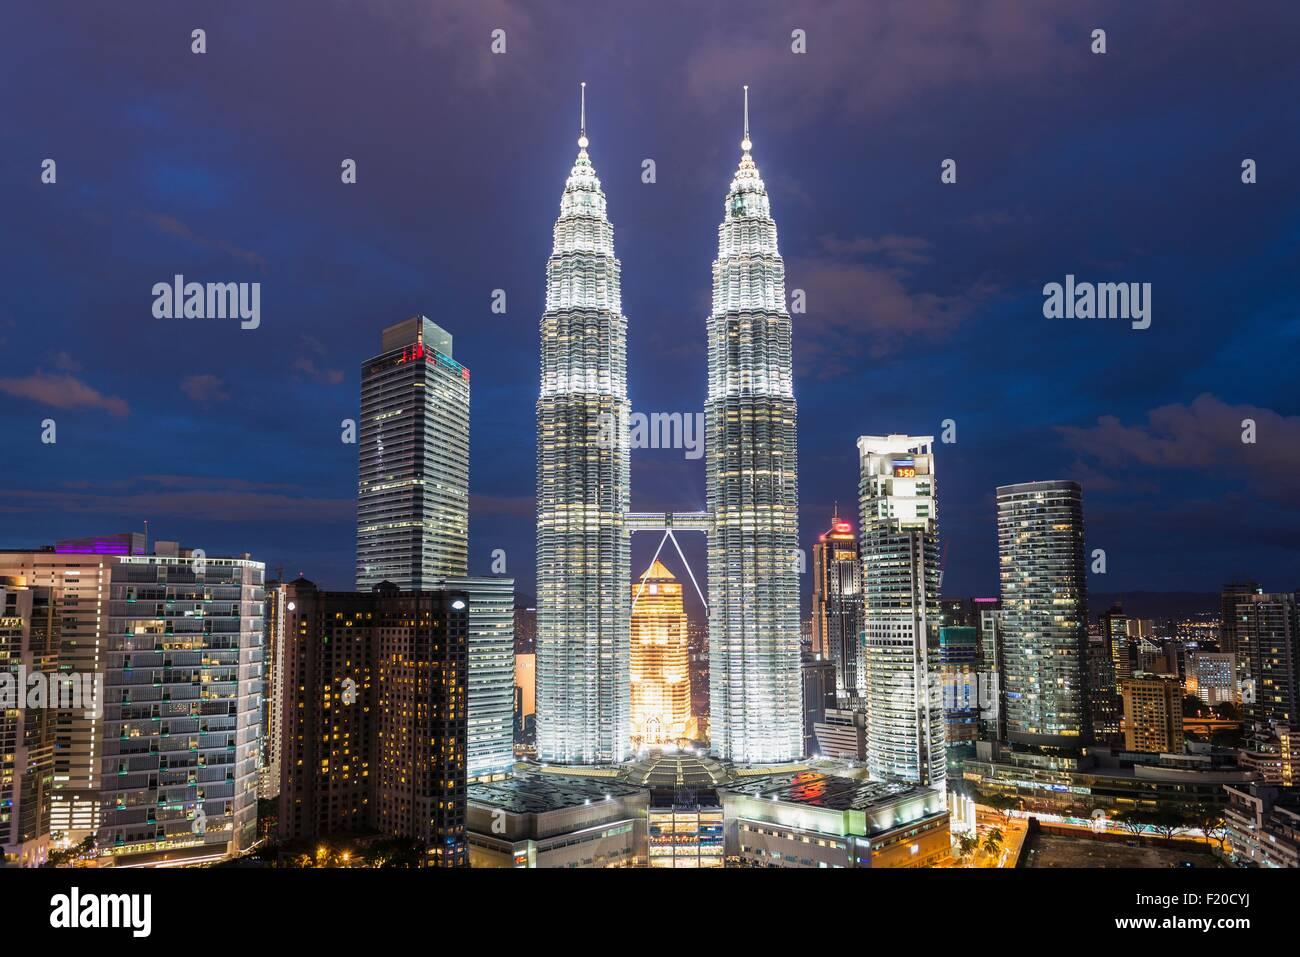 Petronas Towers illuminated at night, Kuala Lumpur, Malaysia - Stock Image